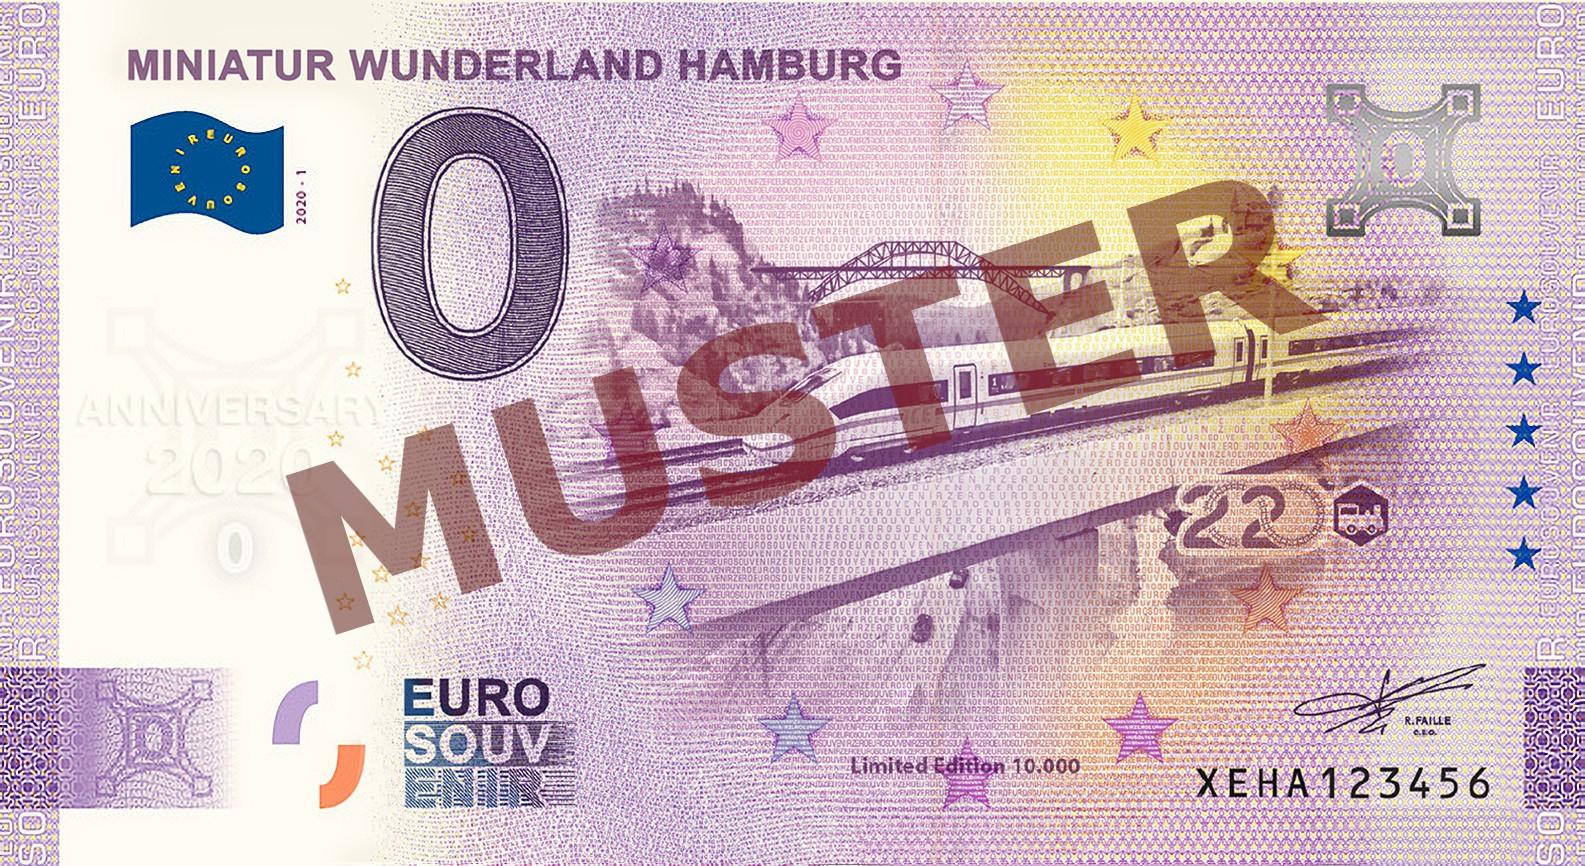 "Euro-Souvenir-Banknote Motif ""ICE4"" (2020-11.2) Anniversary-Edition"